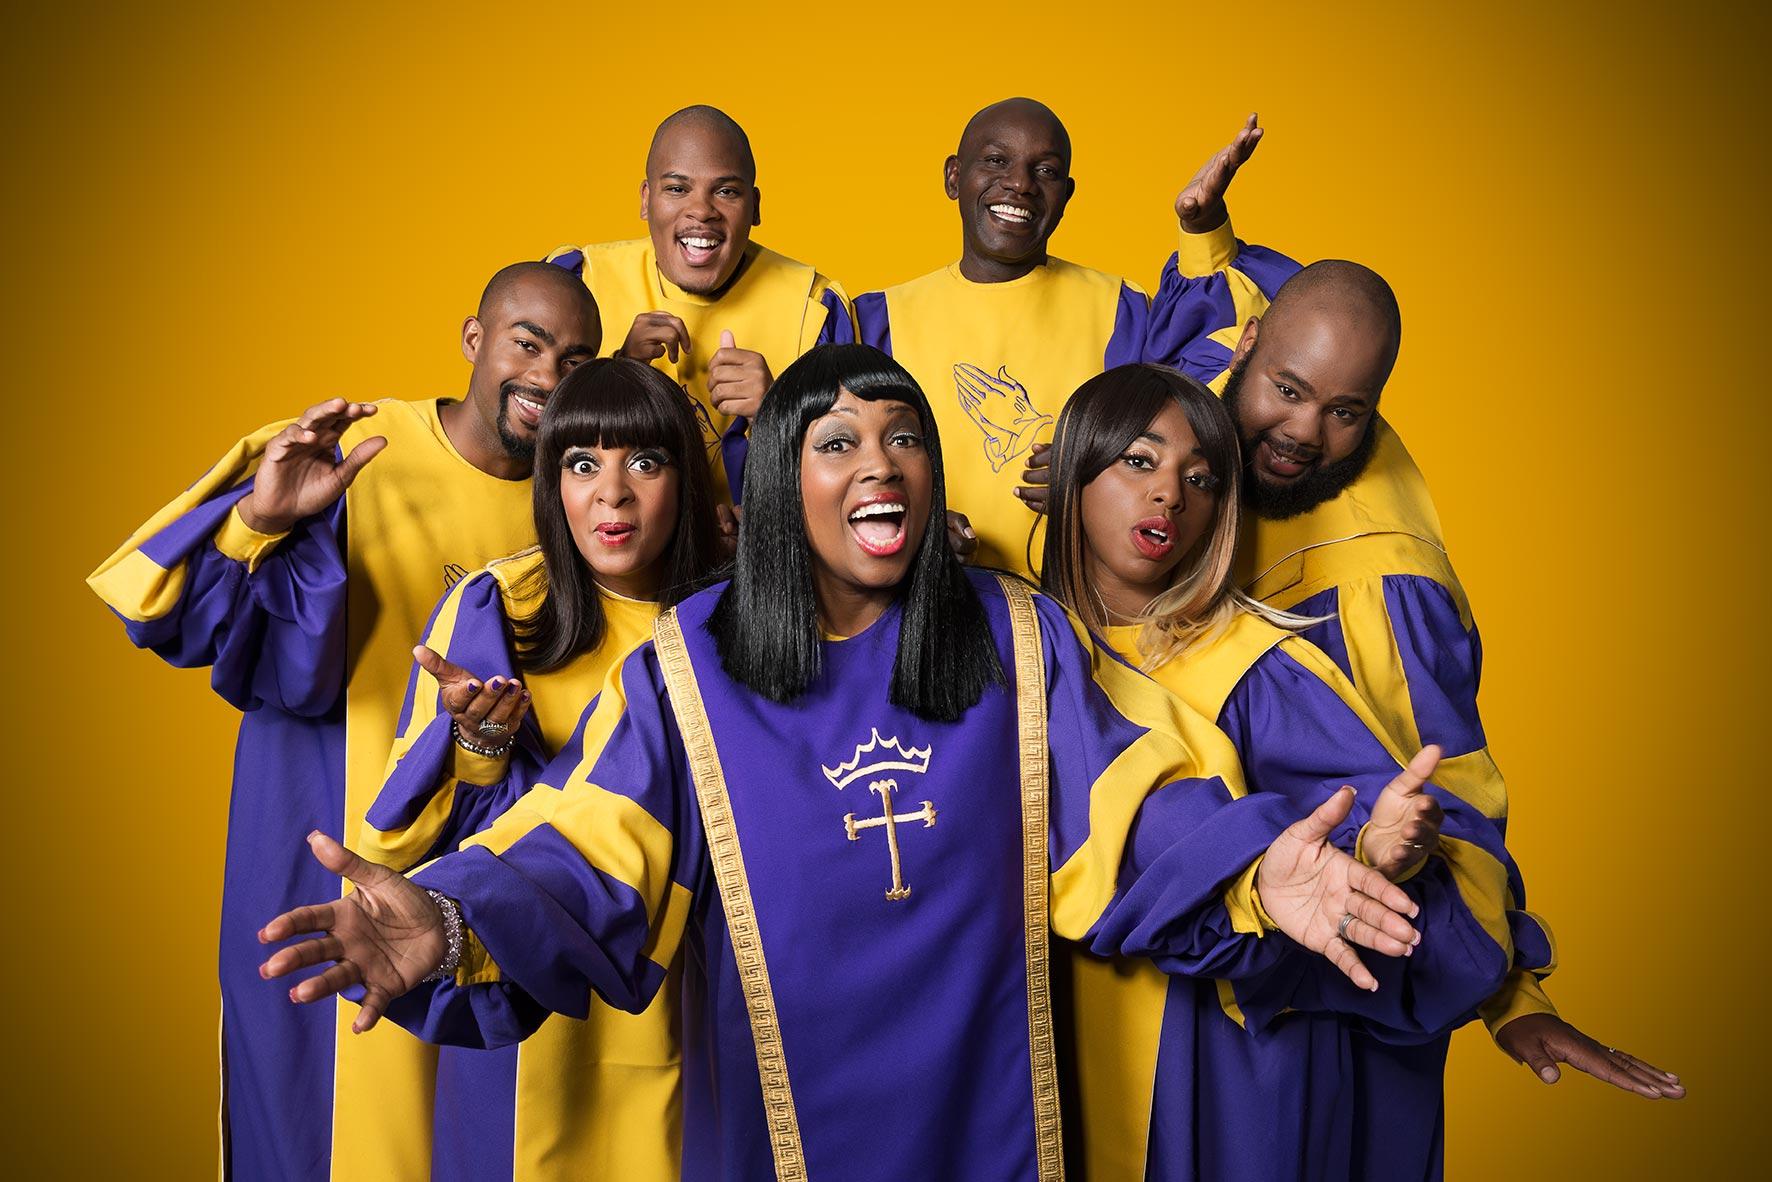 Glory Gospel Singers aus New York, Plakatmotiv